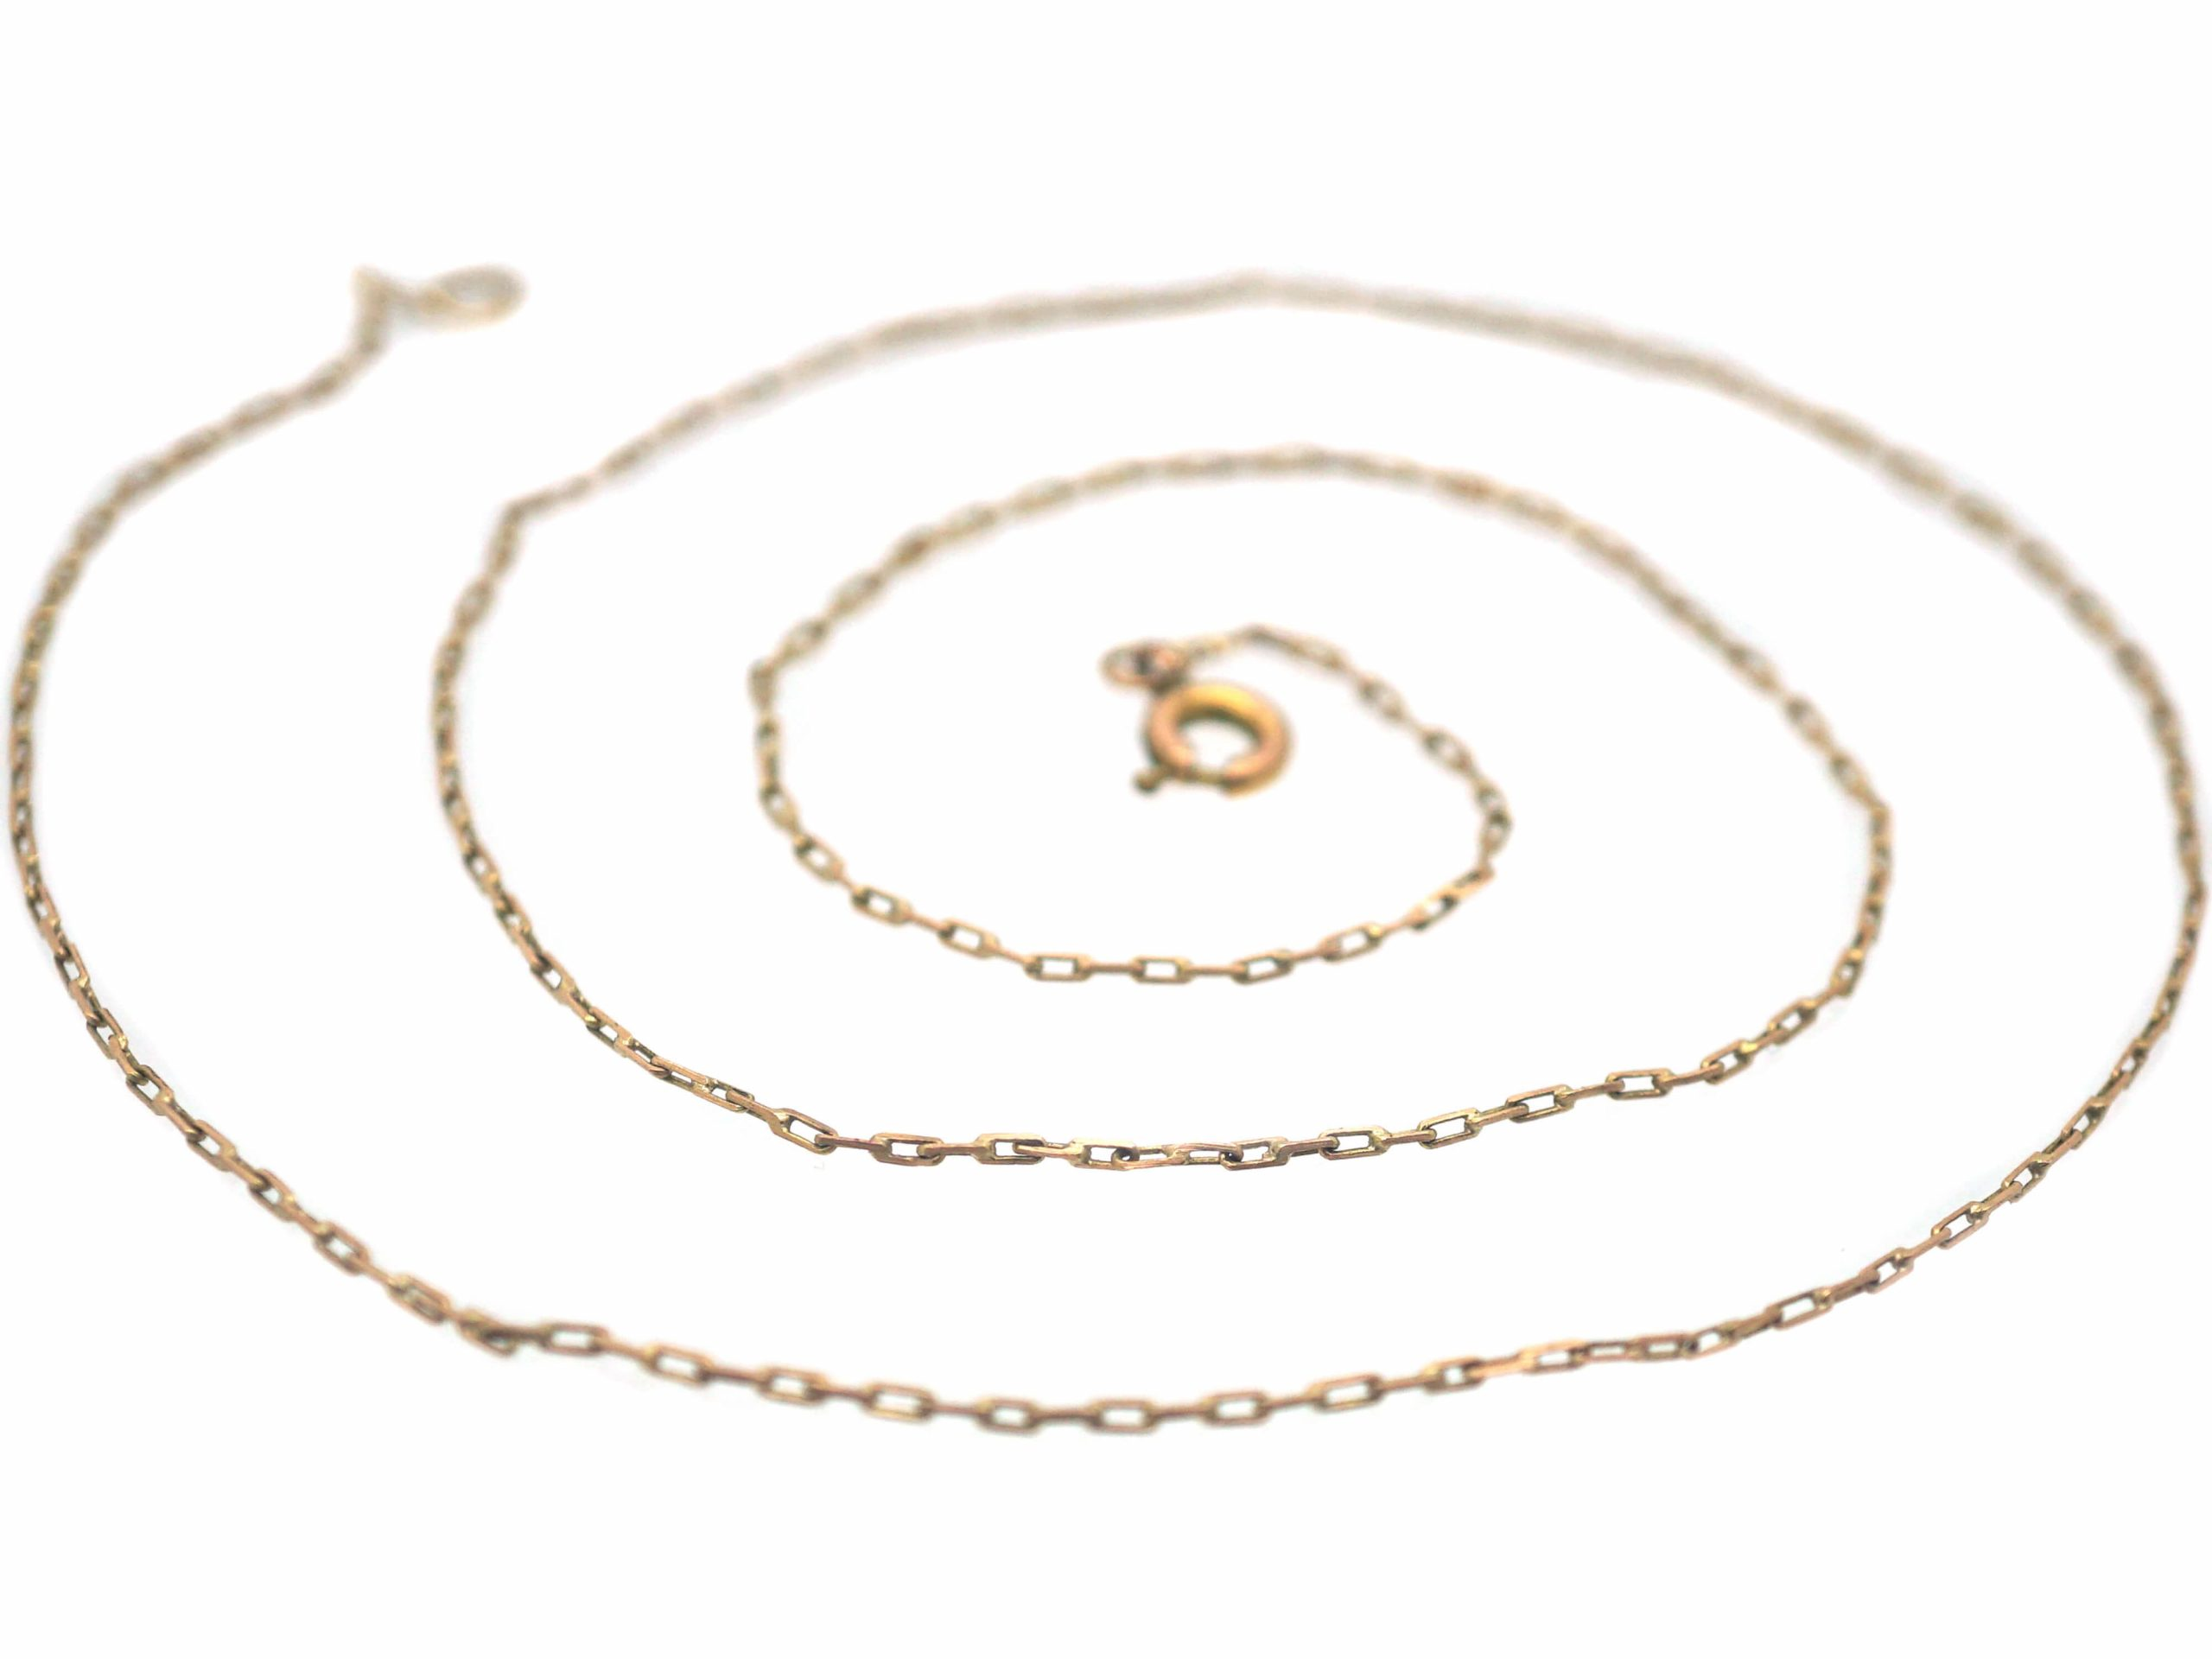 Edwardian 9ct Gold Narrow Box Link Chain